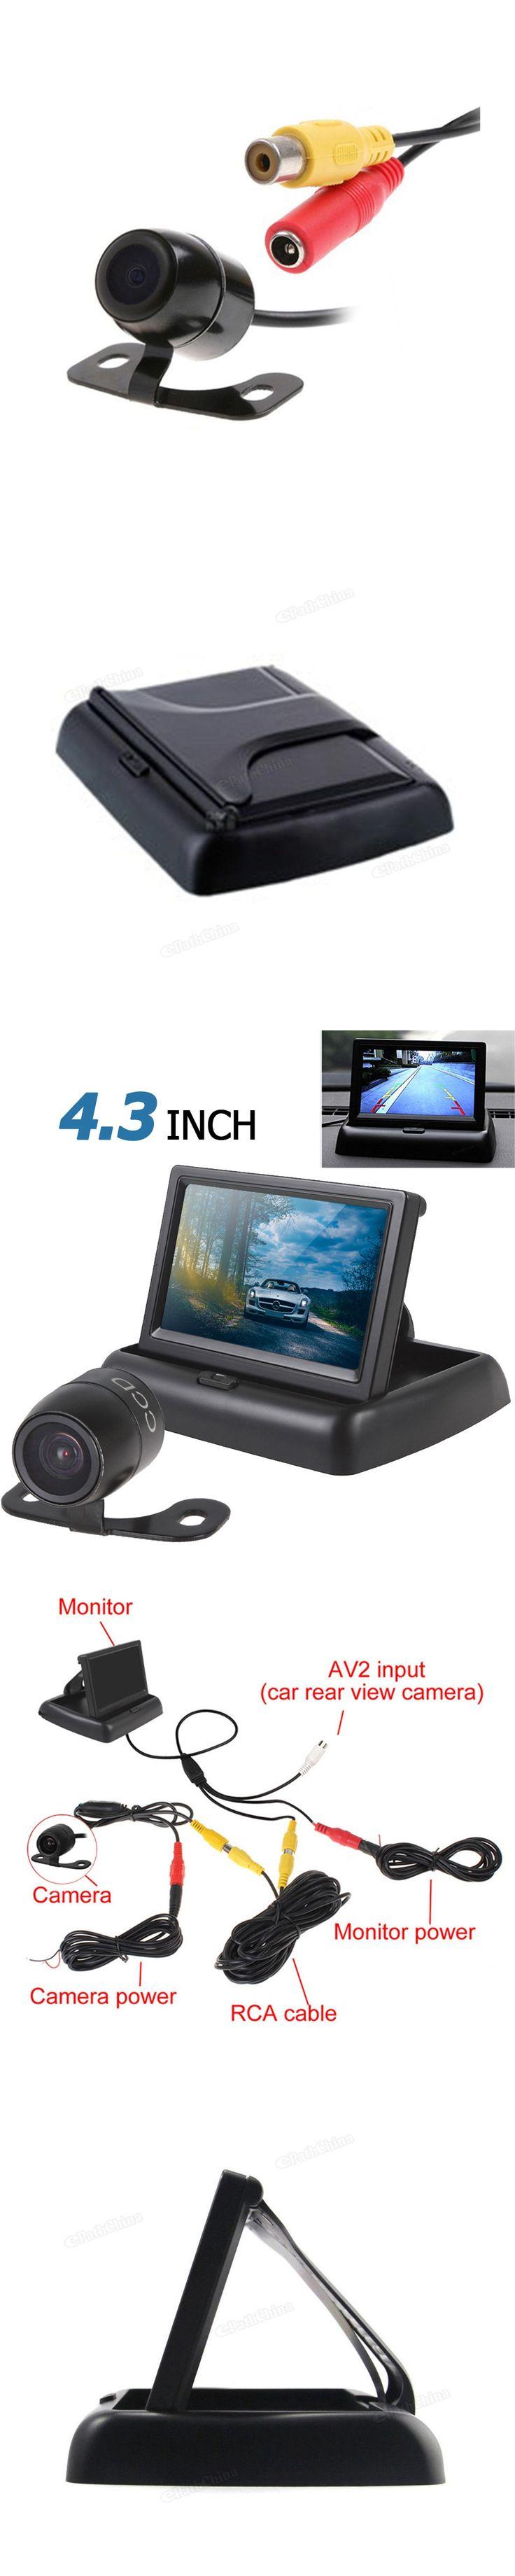 CAR HORIZON Hot Sale 4.3 Inch Car Monitor TFT LCD Car Rear View Monitor + Waterproof 420 TVL 18mm Lens Reverse Parking Camera